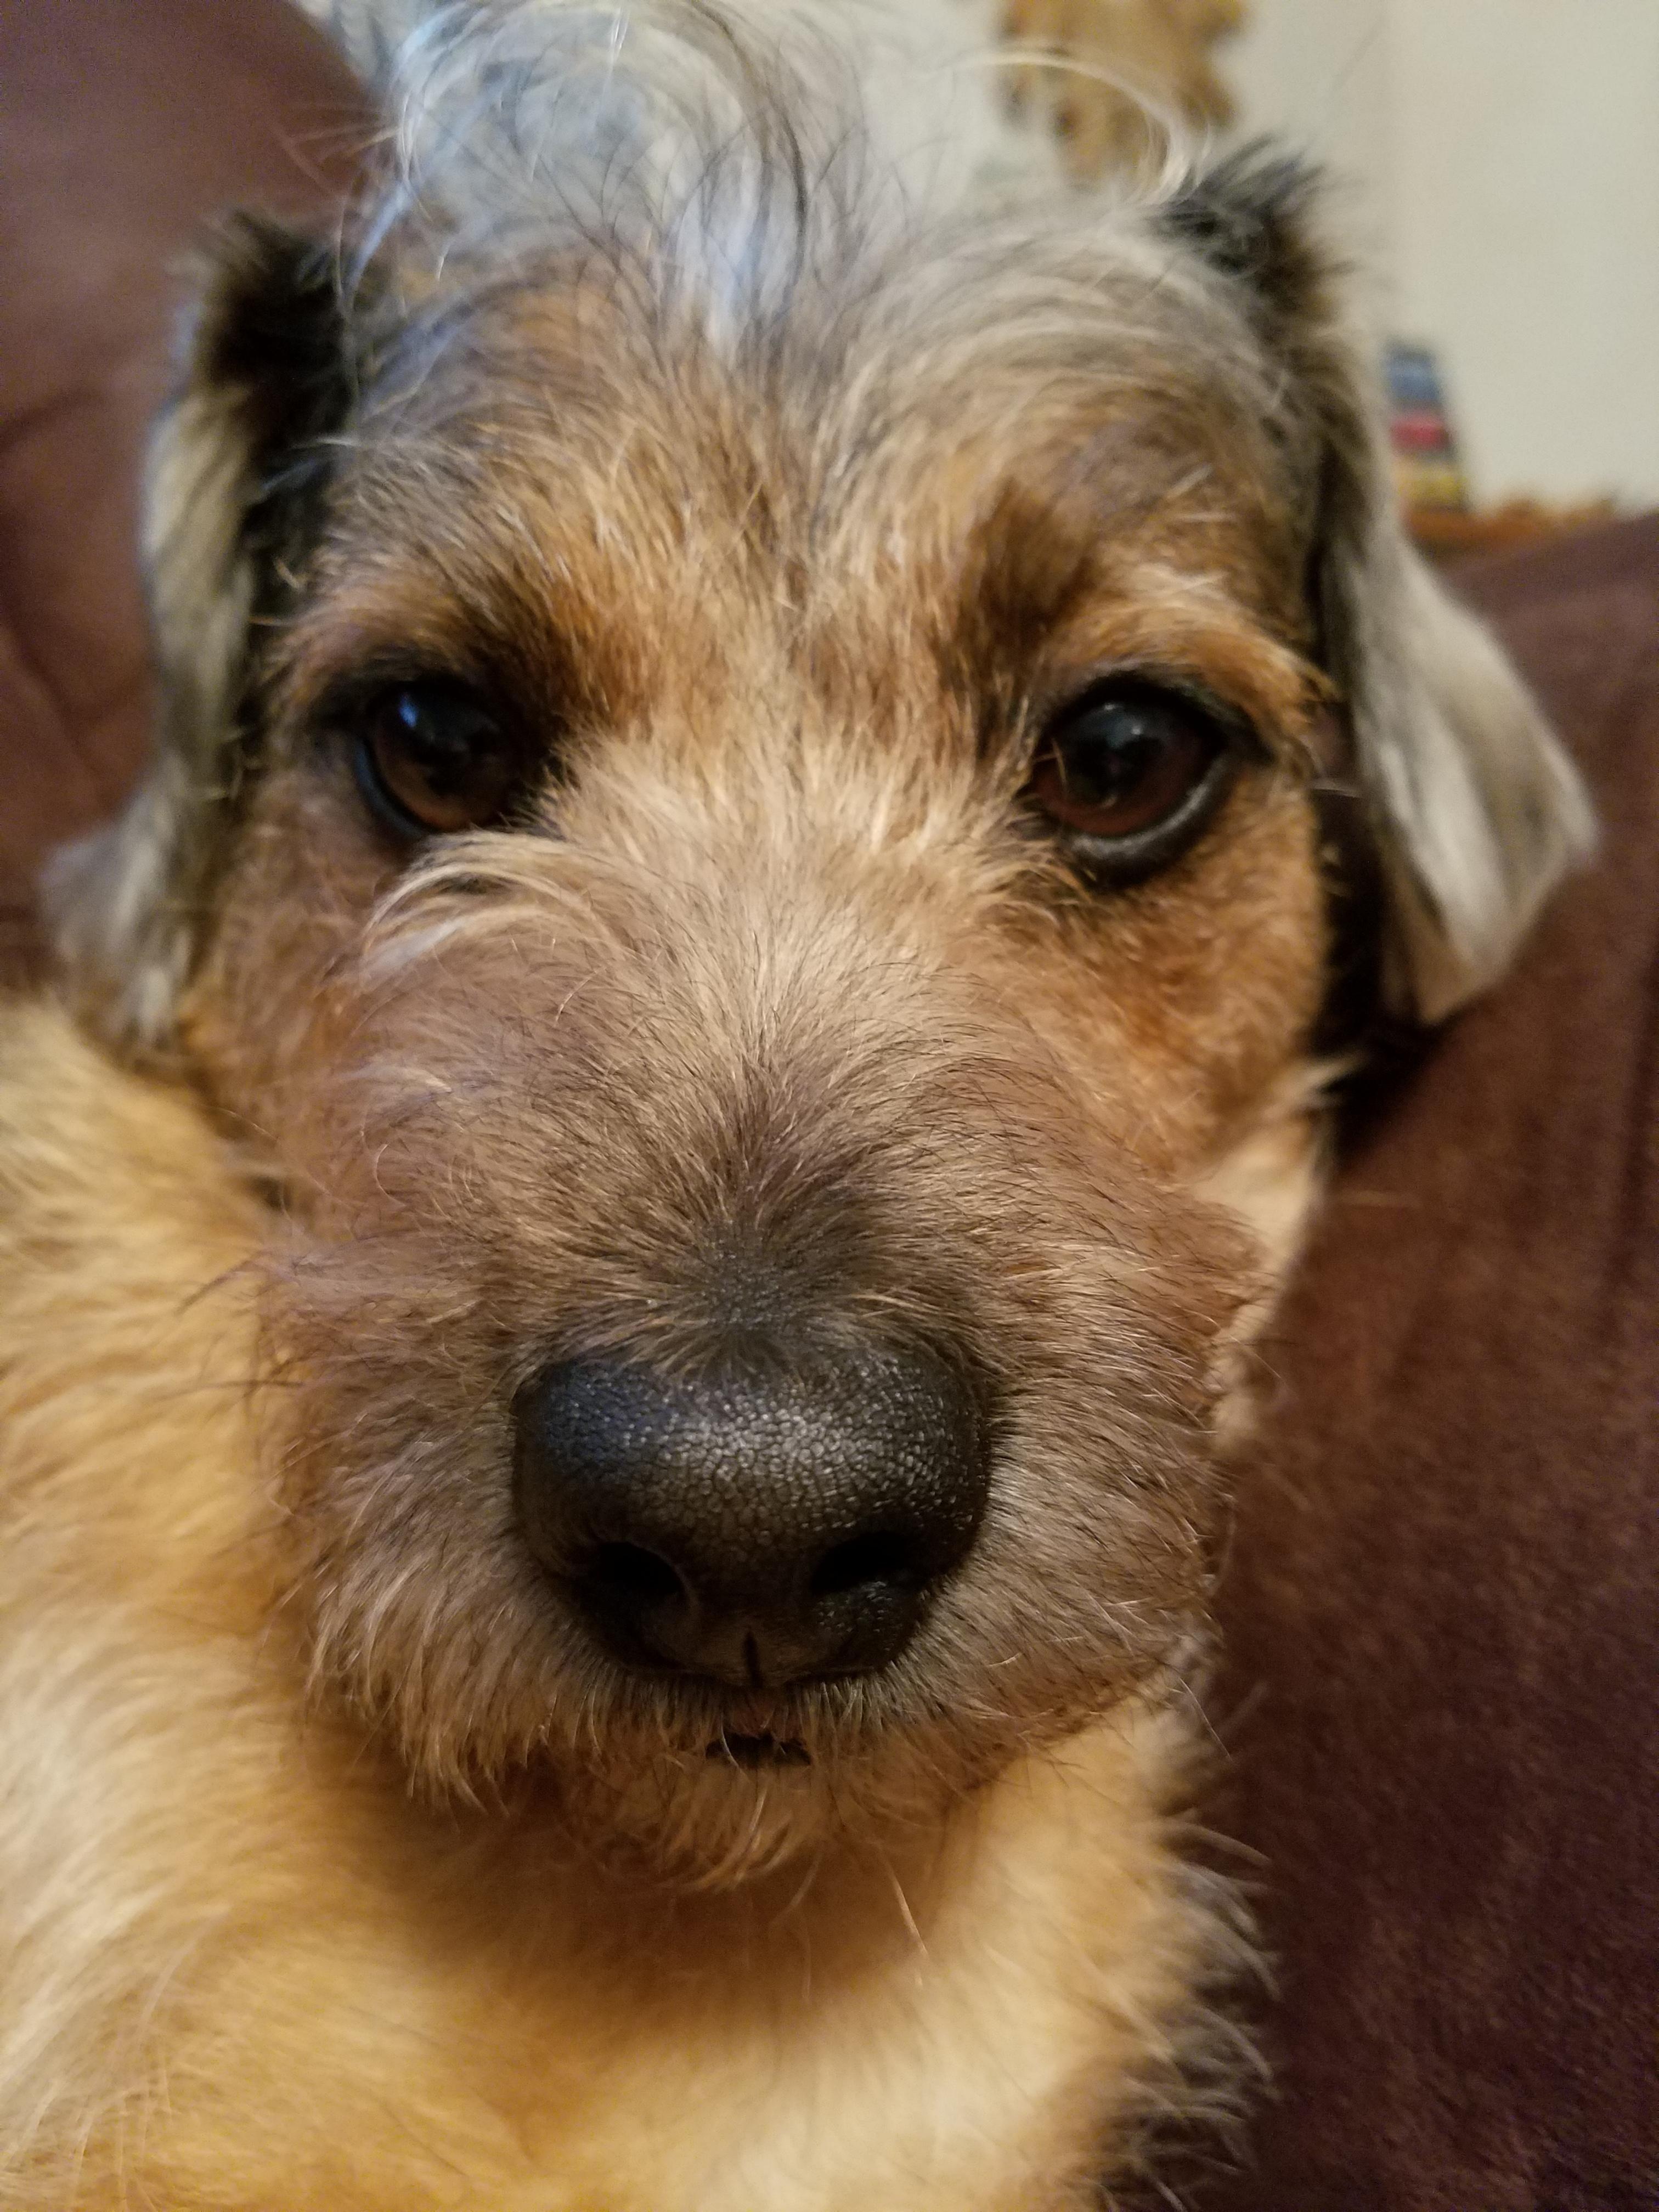 Reddit say hello to my new puppy Milo http://ift.tt/2p9rrK5